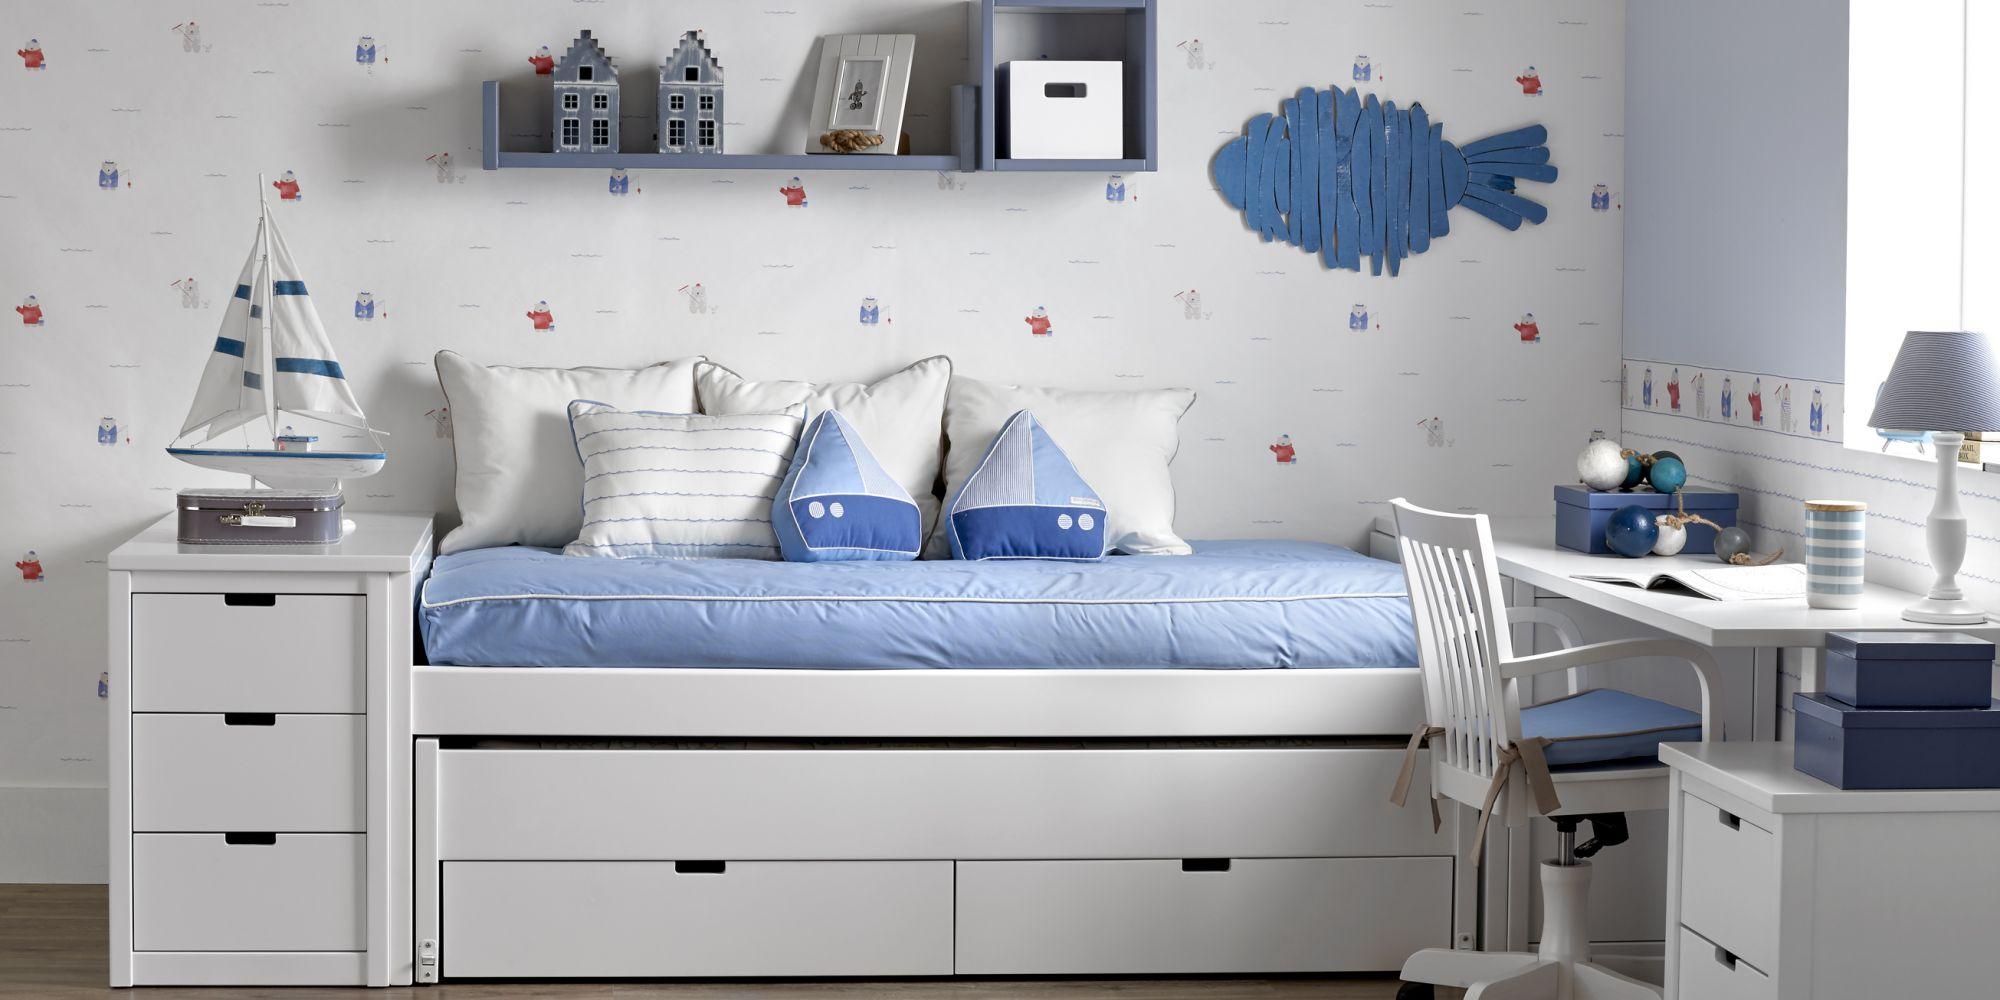 Minicompacto 2 camas con auxiliar de cajones para almacenaje ropa niño-niña | Mueble Infantil